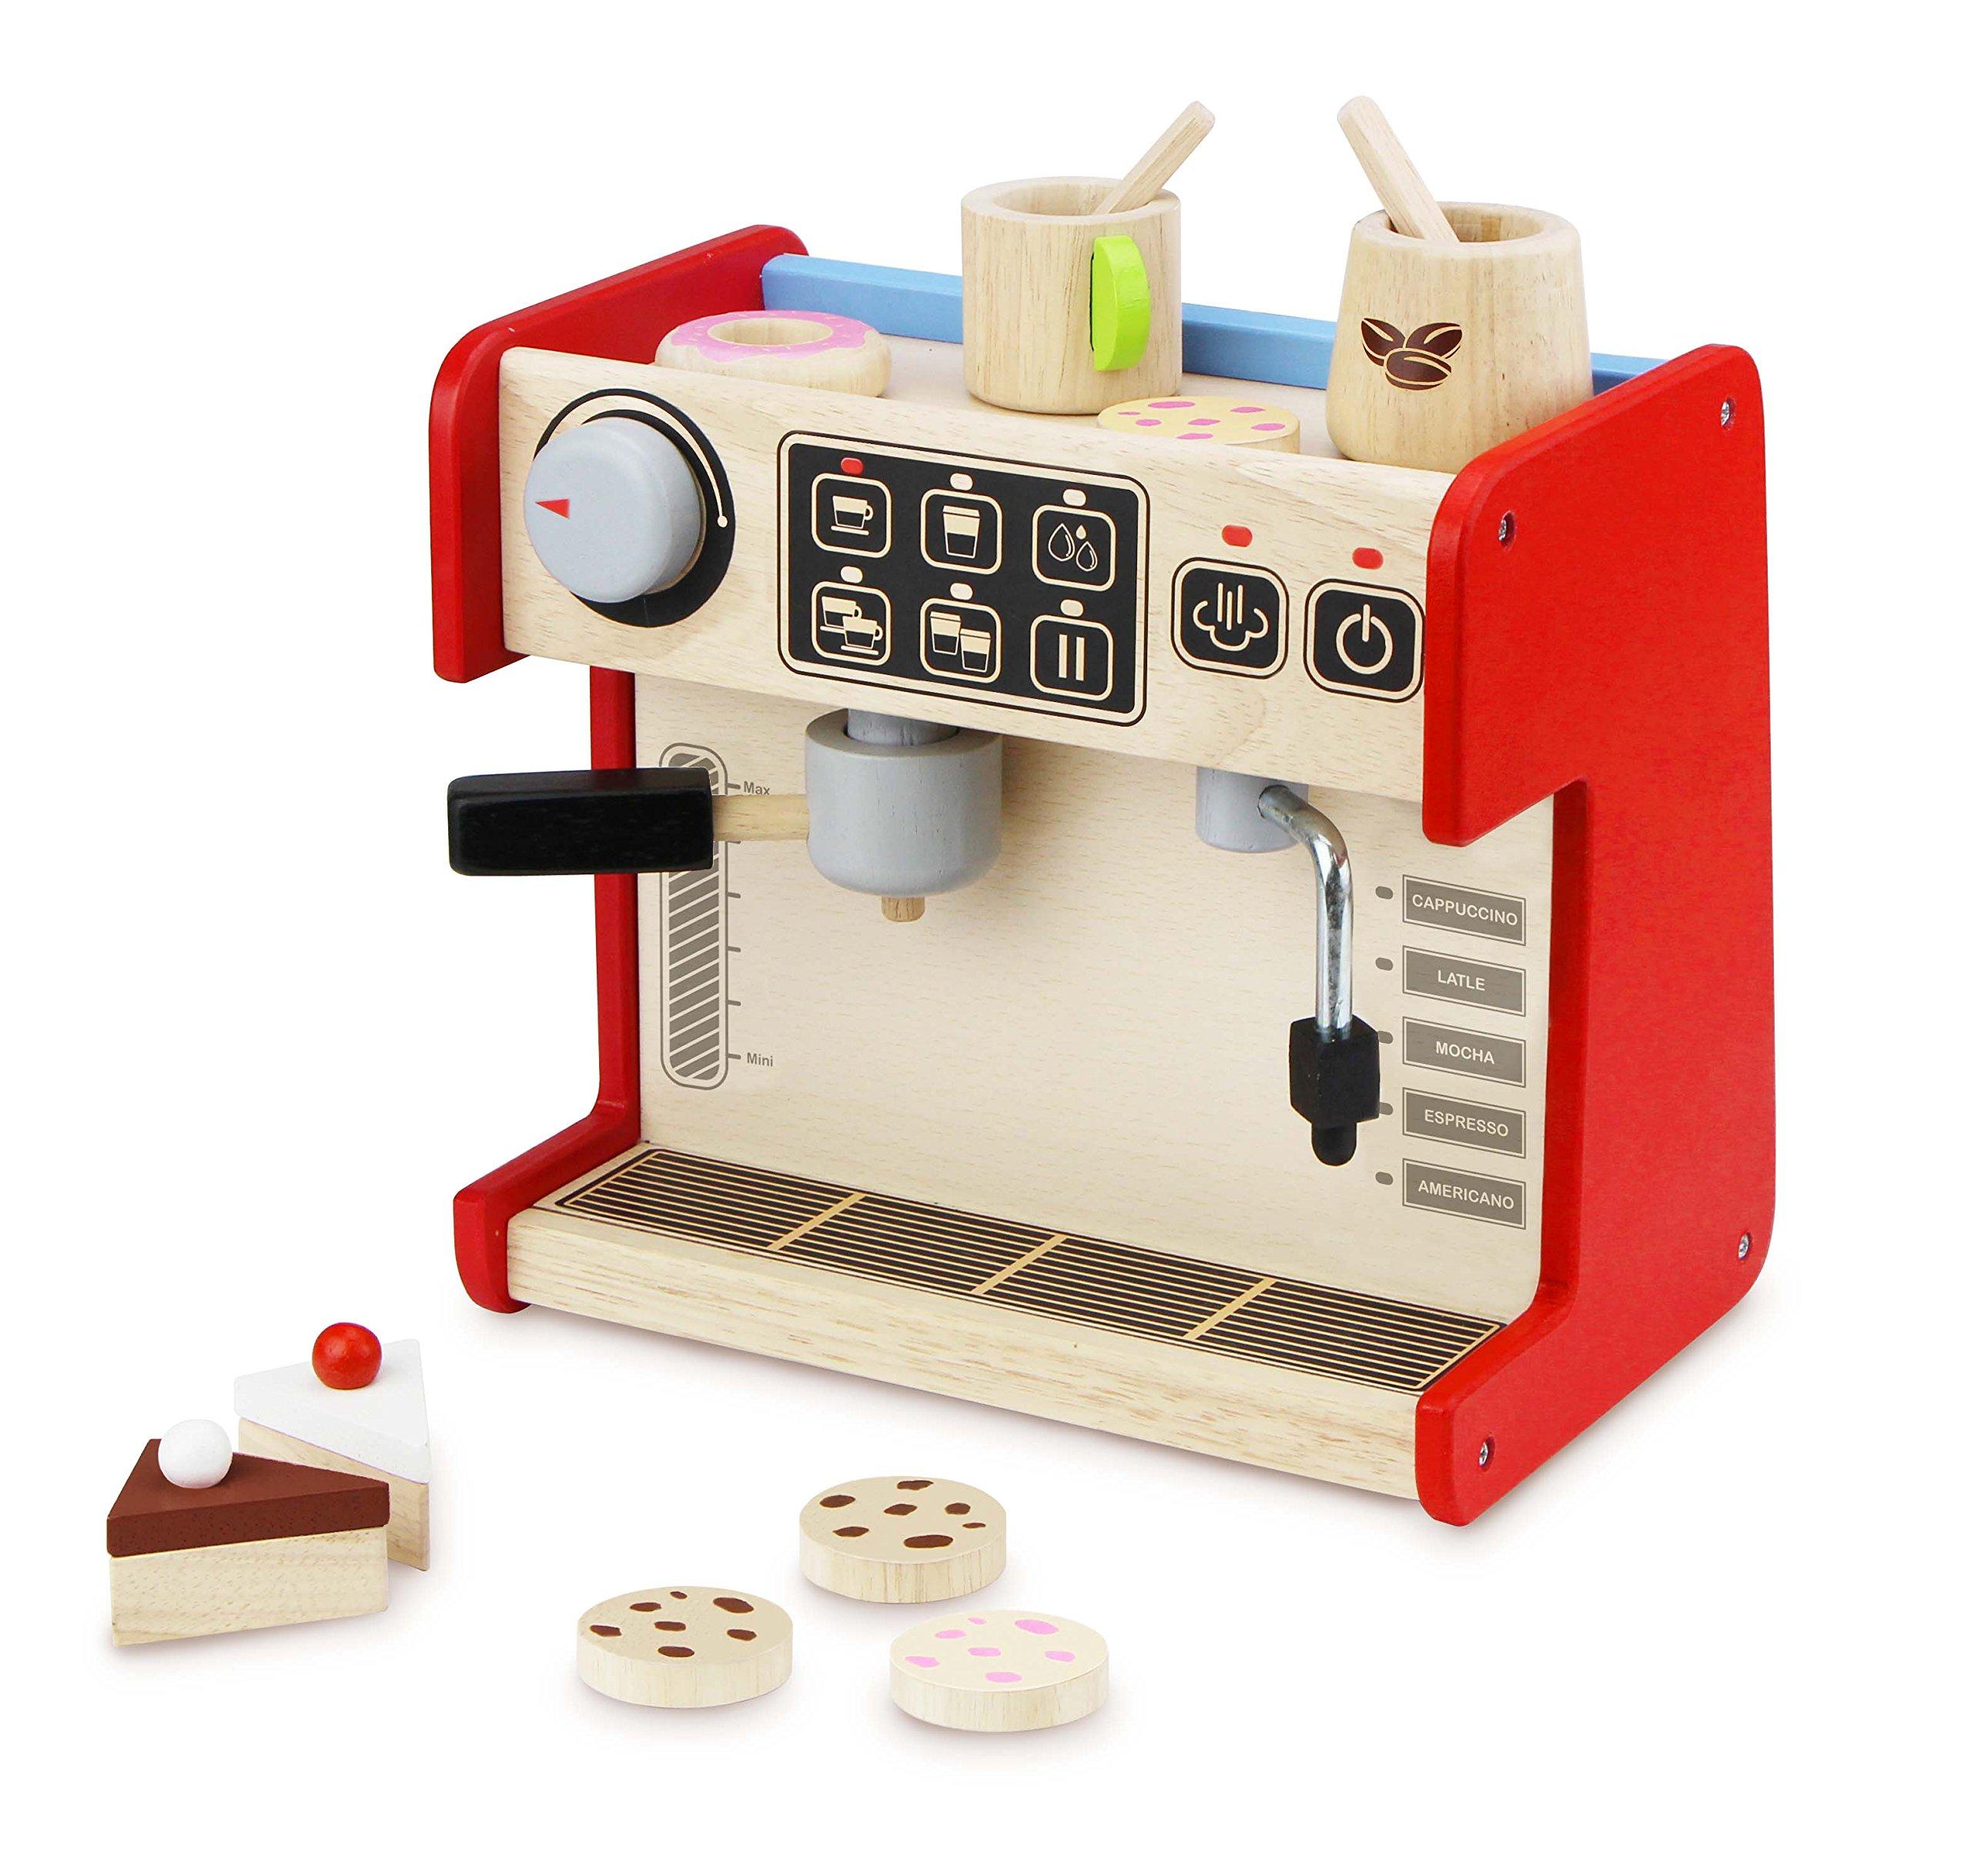 Wonderworld All-in-1 Coffee Shop Pretend Play Toy with Accessories by Wonderworld